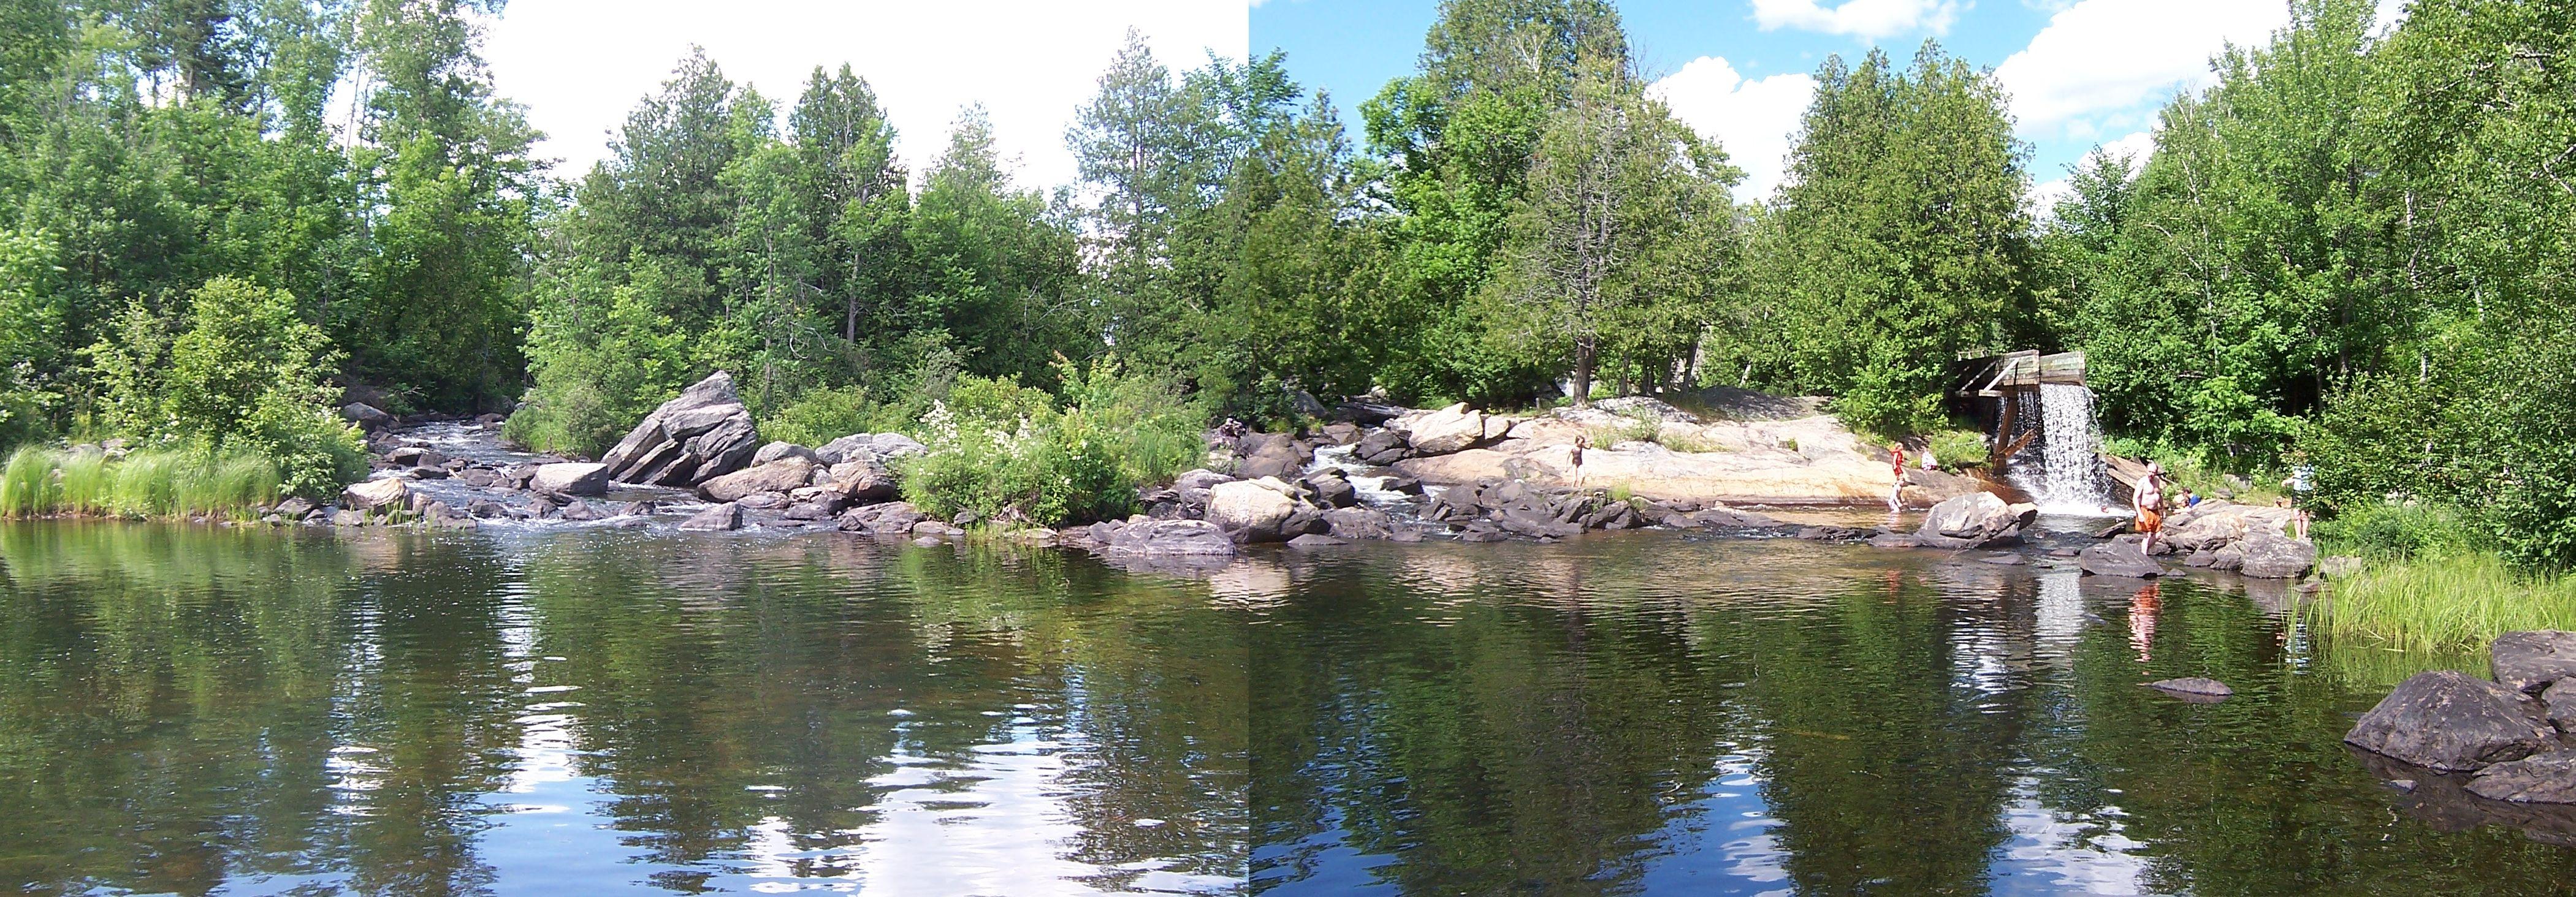 Bancroft Ontario Area Pictures